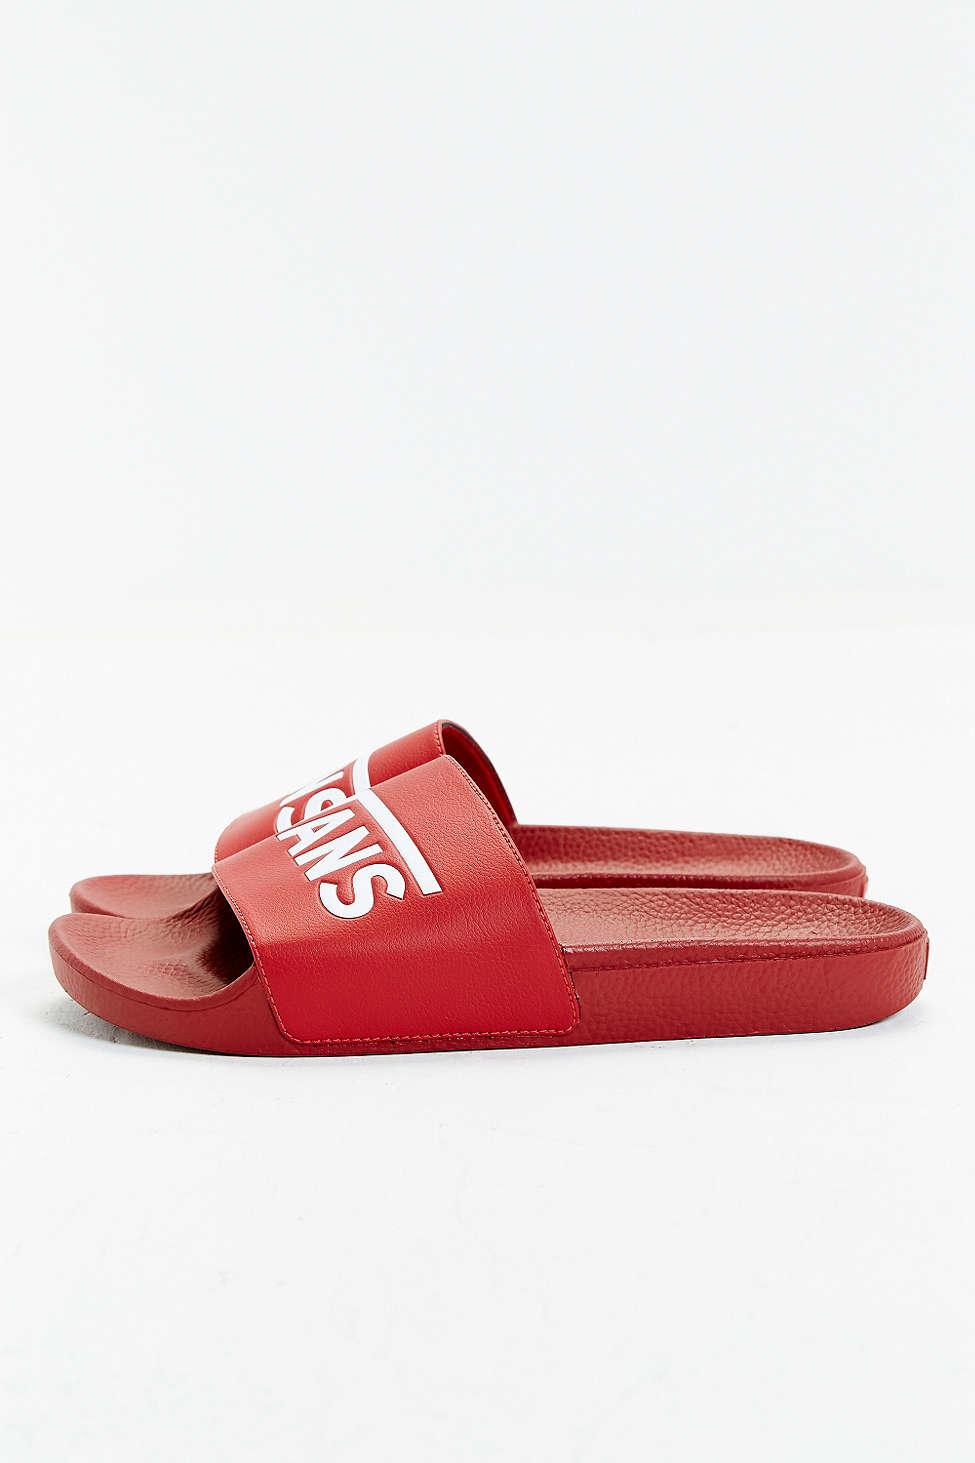 Vans Rubber Slide-on Sandal in Red for